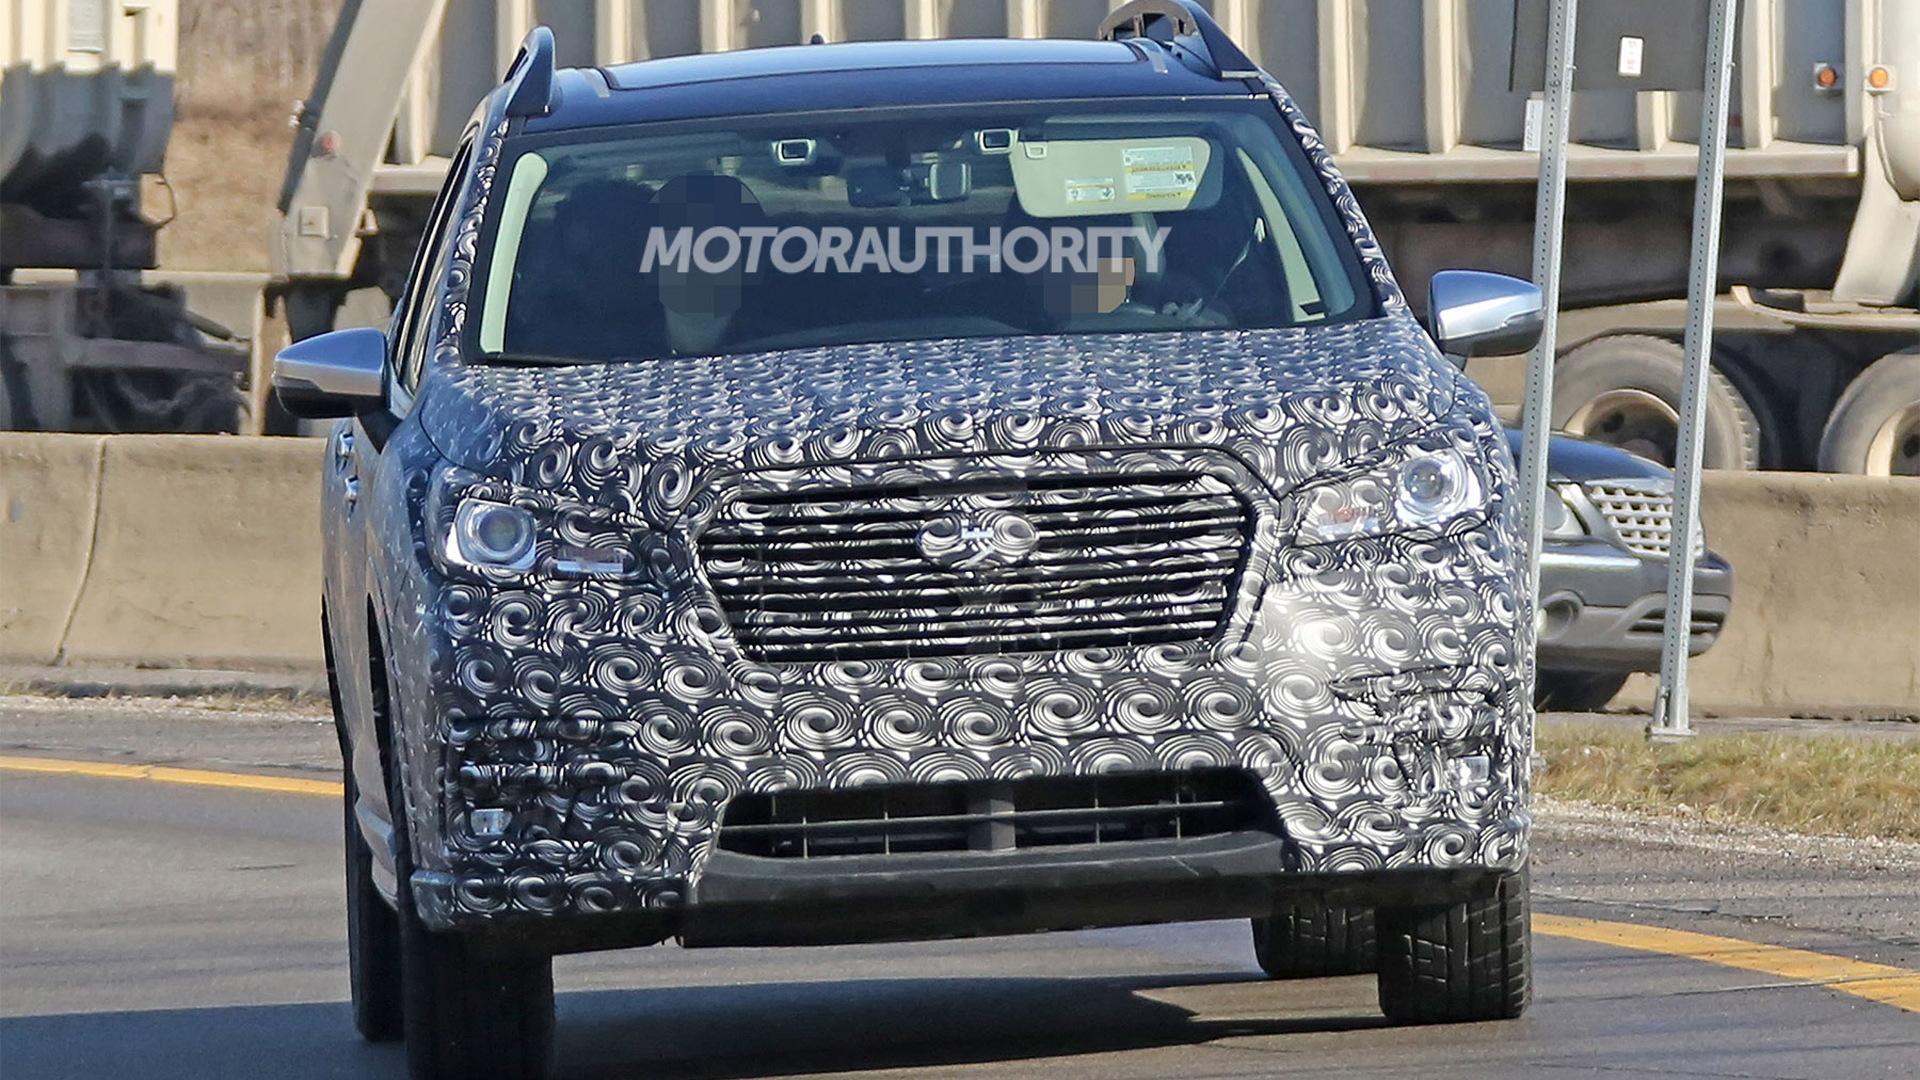 2019 Subaru Ascent spy shots - Image via S. Baldauf/SB-Medien